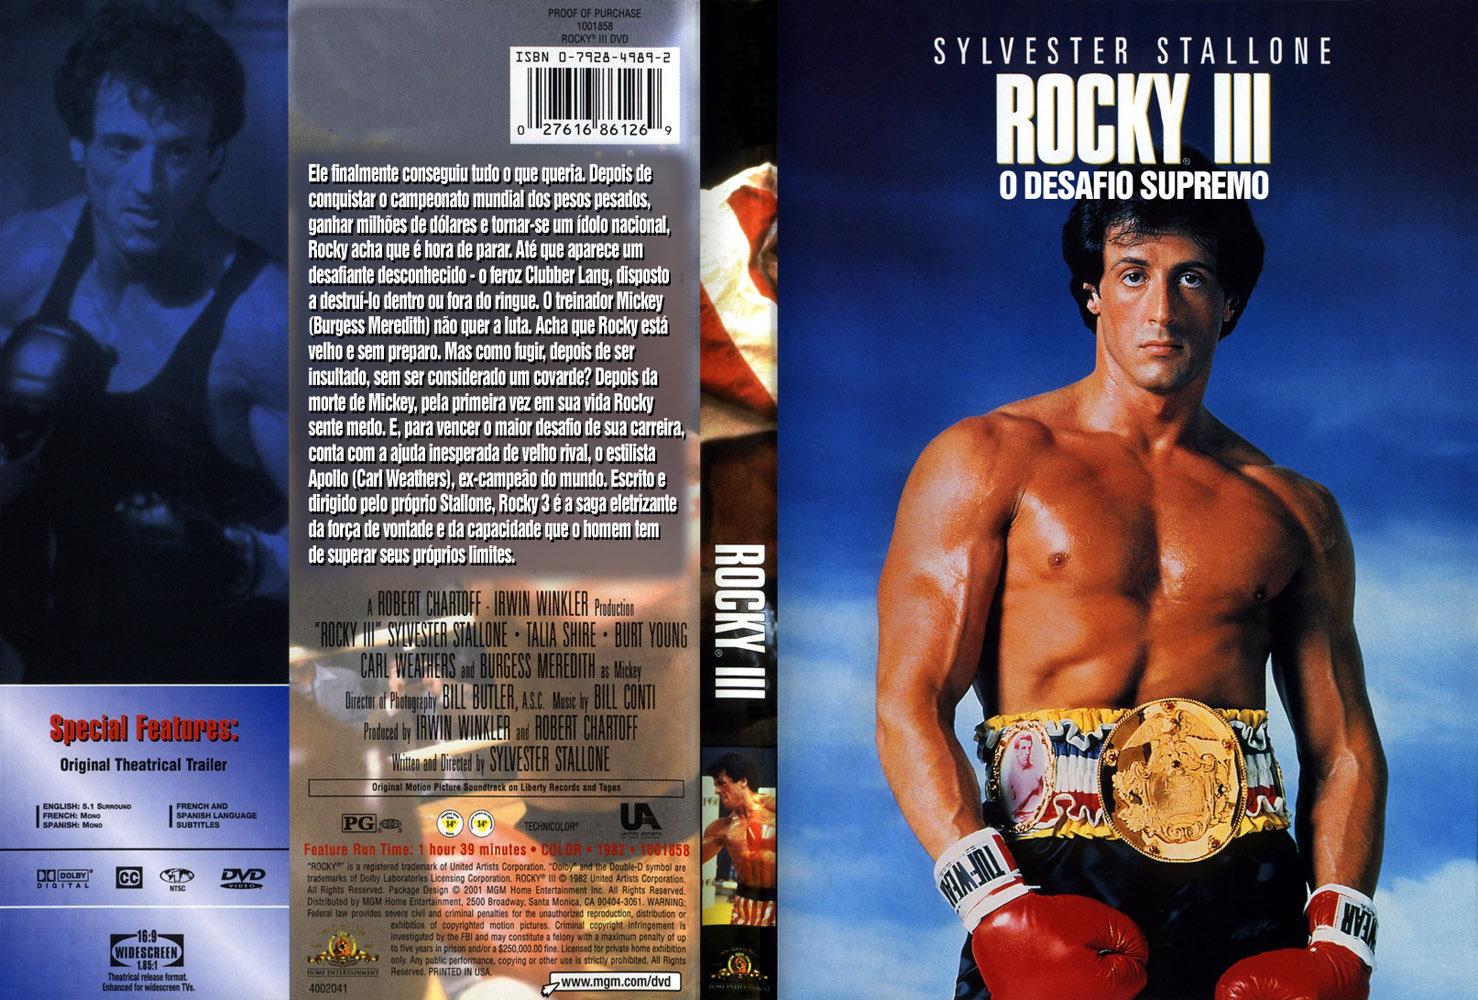 http://4.bp.blogspot.com/_3IcEW8a3cGA/TPS1qVYAigI/AAAAAAAAGe4/tZt7iU-FXkY/s1600/Rocky_3.jpg